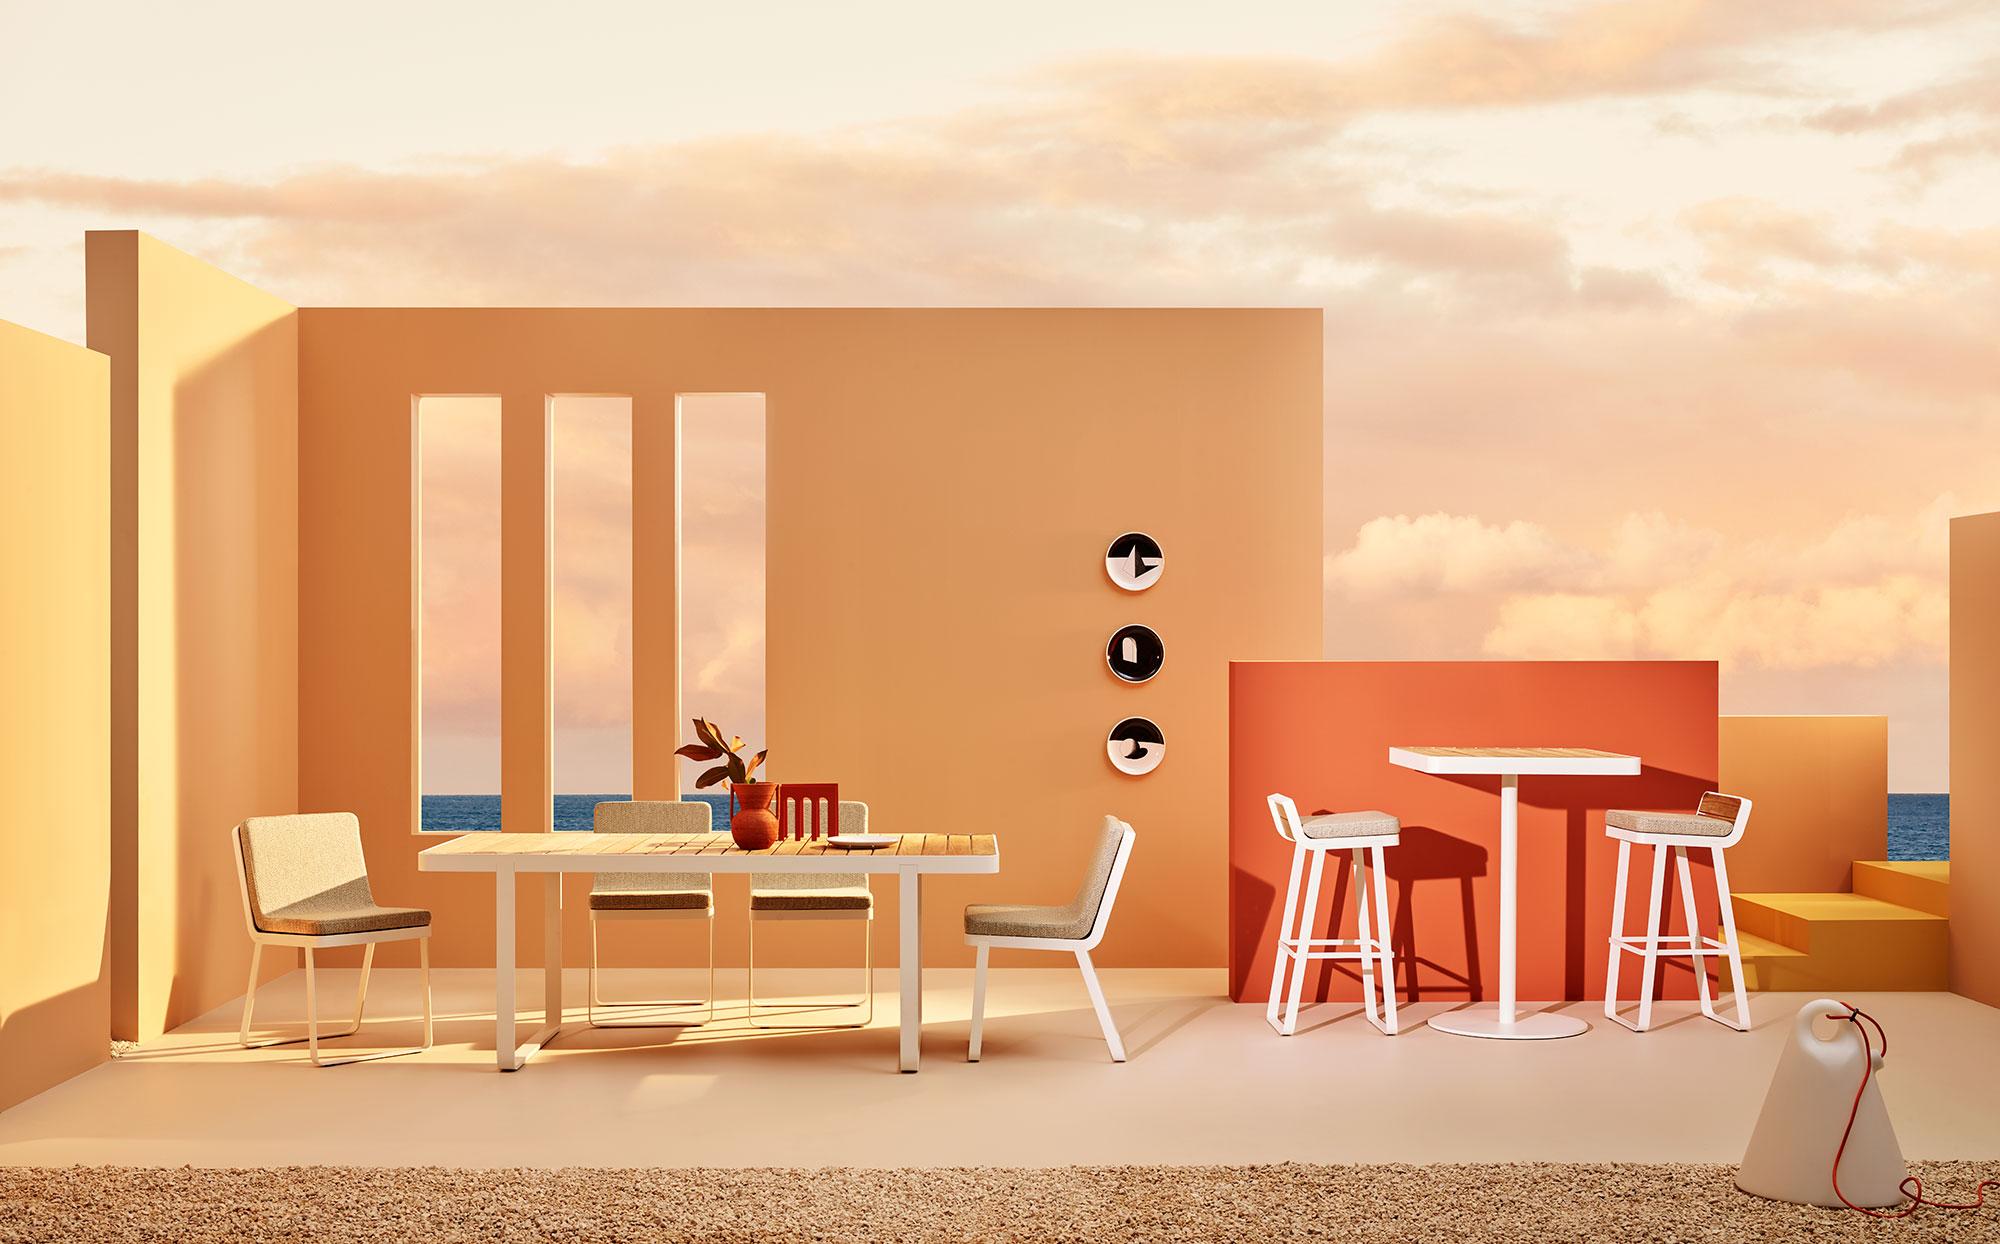 Sedia Lounge Makemake, sedia lounge da esterno/Makemake Lounge Chair, outdoor lounge chair